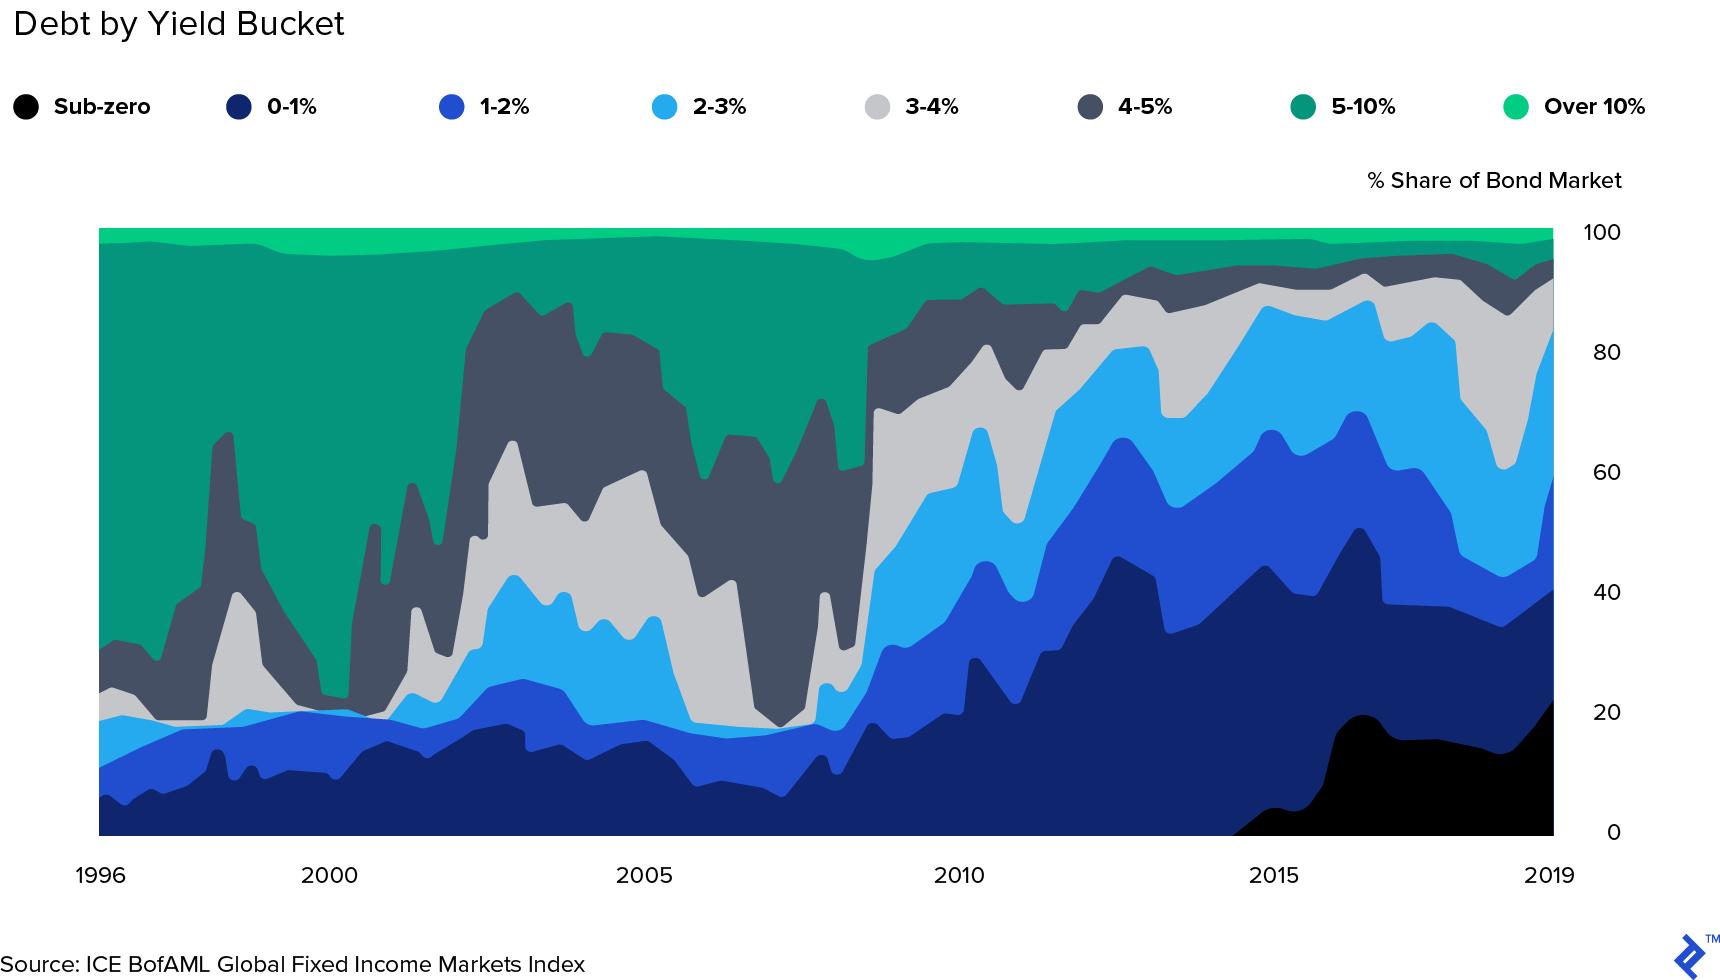 Share of global bond market by yield bucket (1996 - 2019)